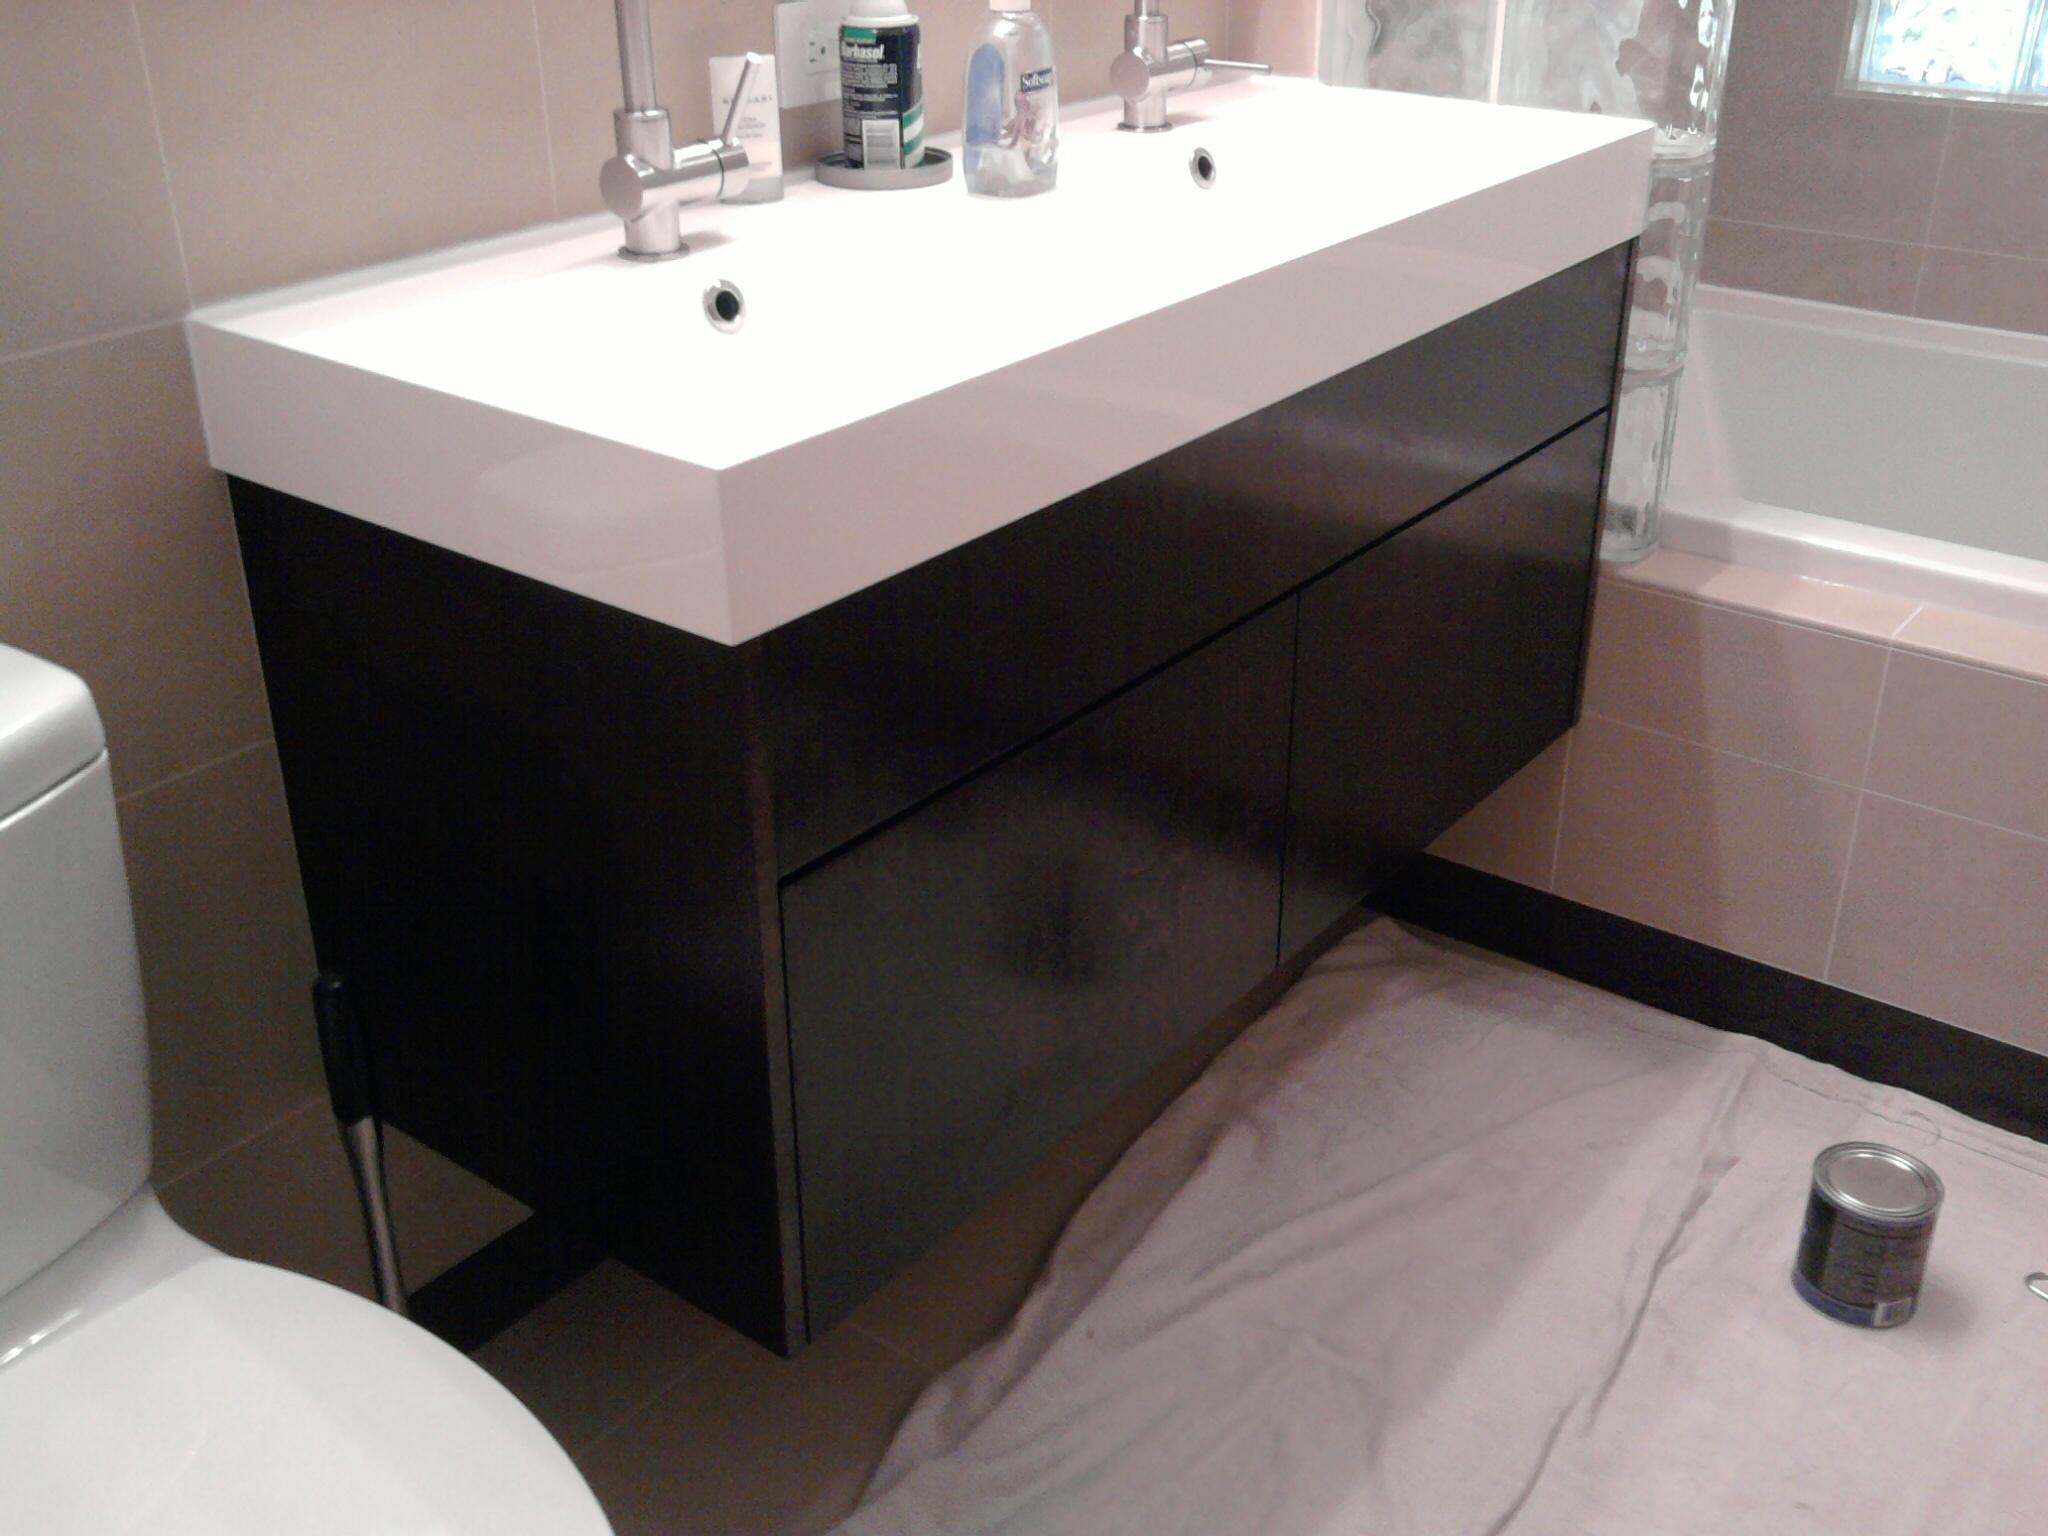 1907 school house farmhouse bathroom san luis obispo by - School Bathroom Sinks 17 Best Ideas About Double Sink Bathroom On